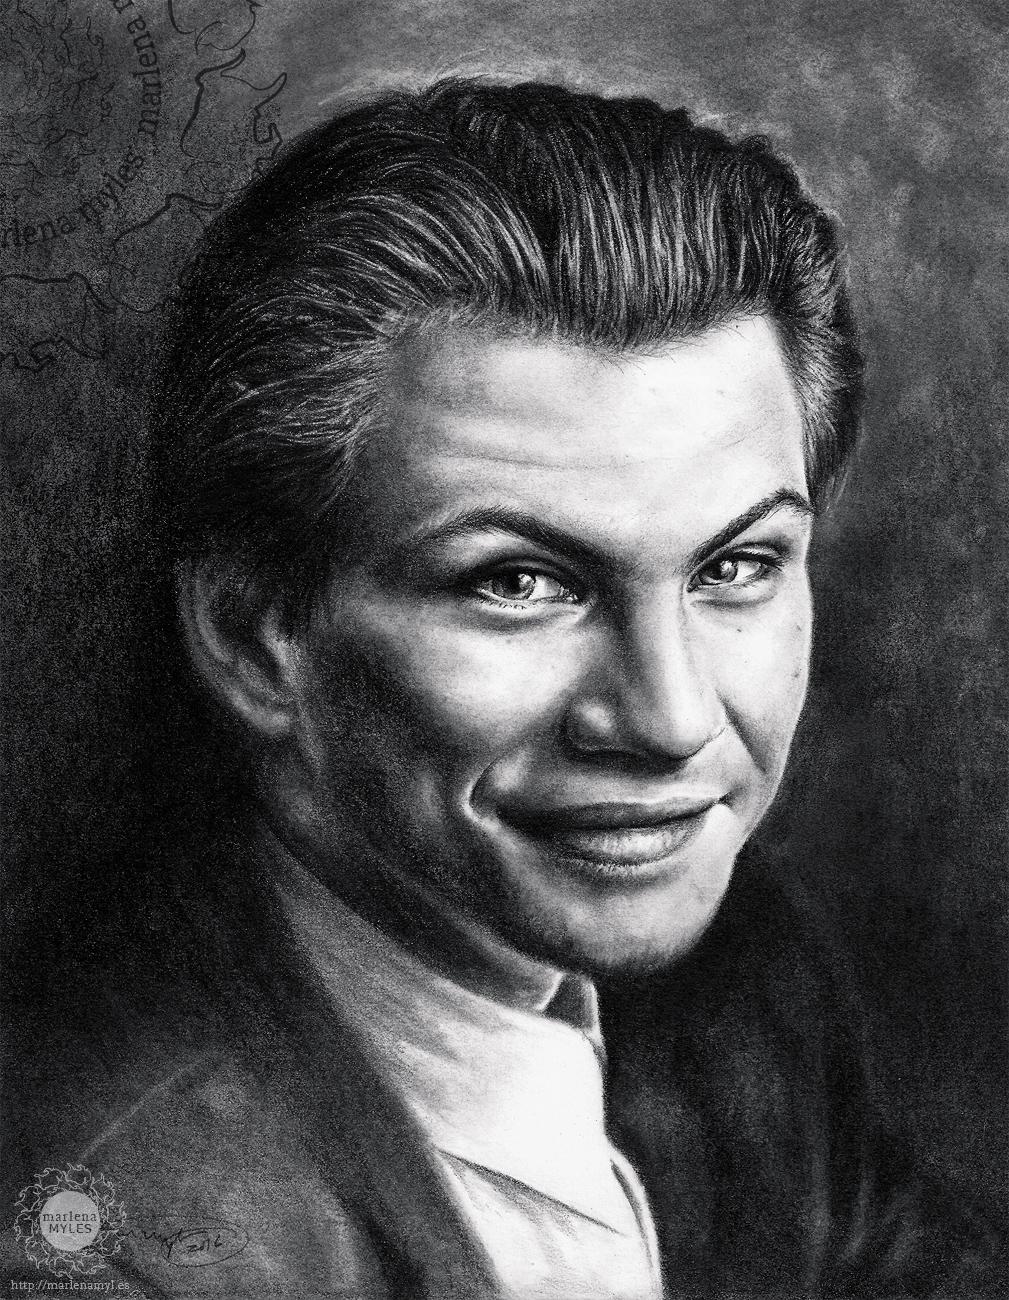 Portrait drawing of Christian Slater